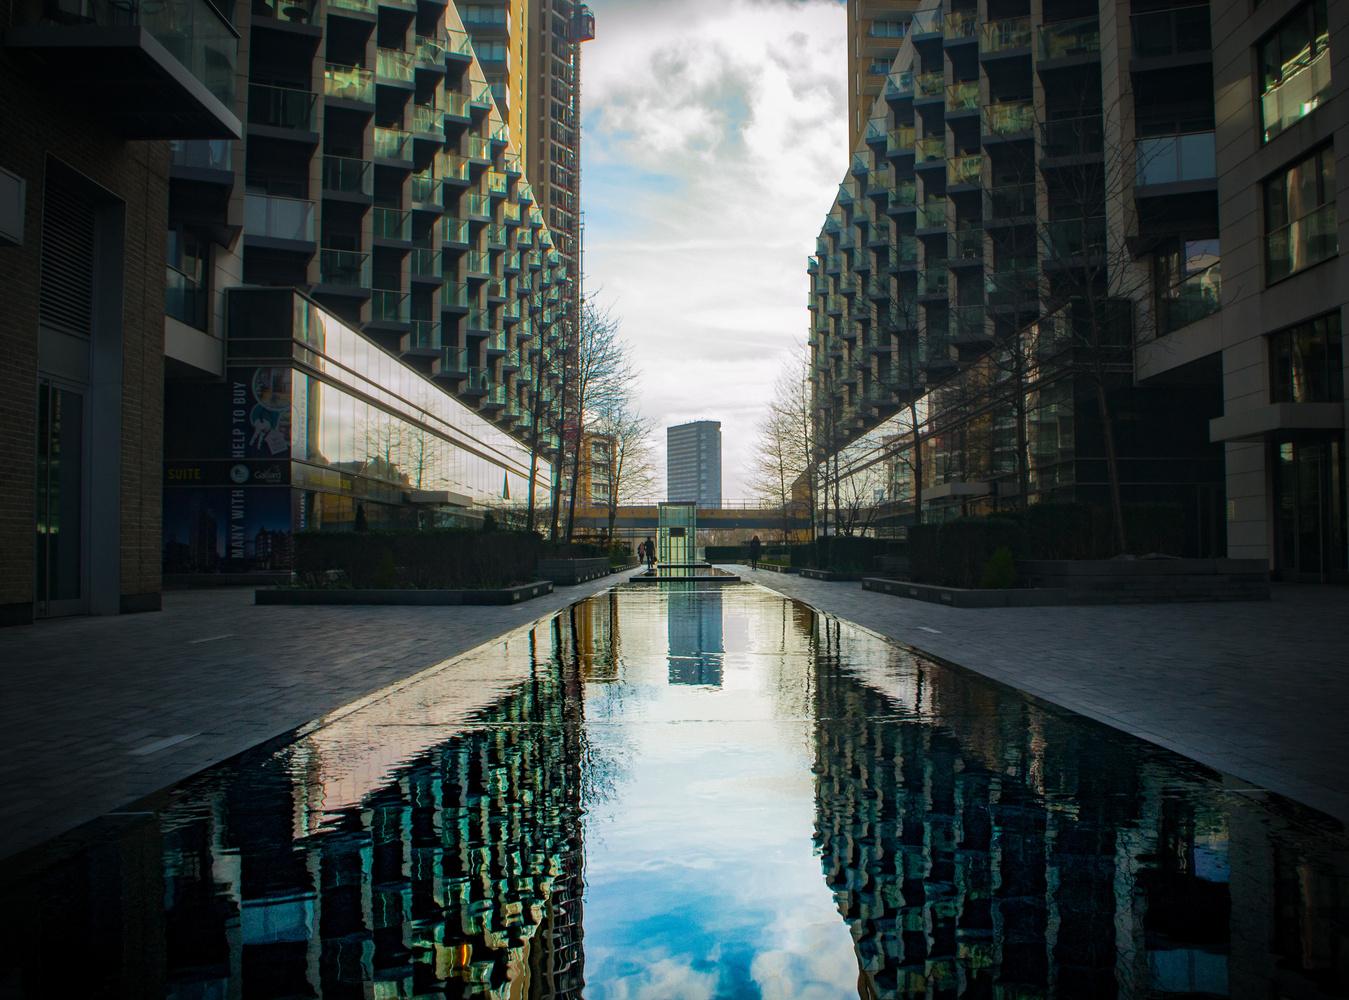 Canary Wharf #5 by Tom Juggins